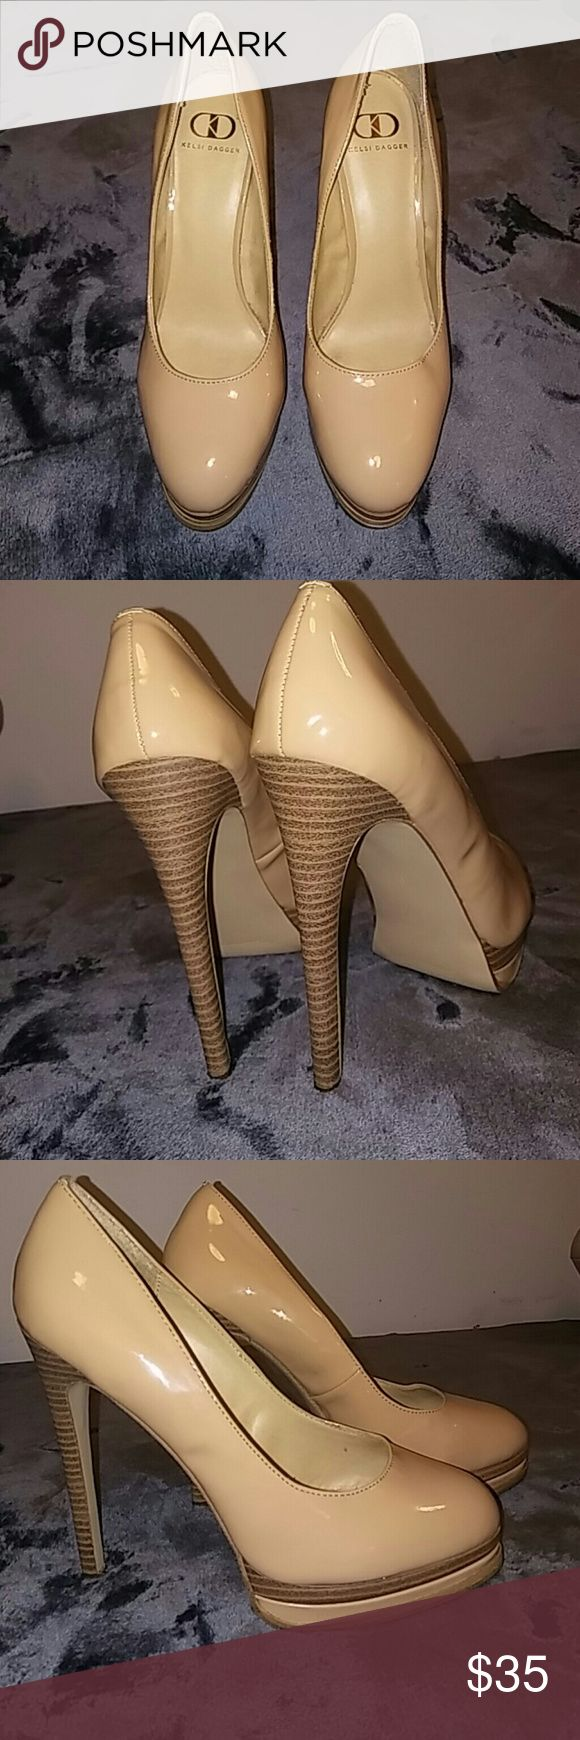 Kelsi dagger nude heels Hardly worn Kelsi dagger nude heels Kelsi Dagger Shoes Heels